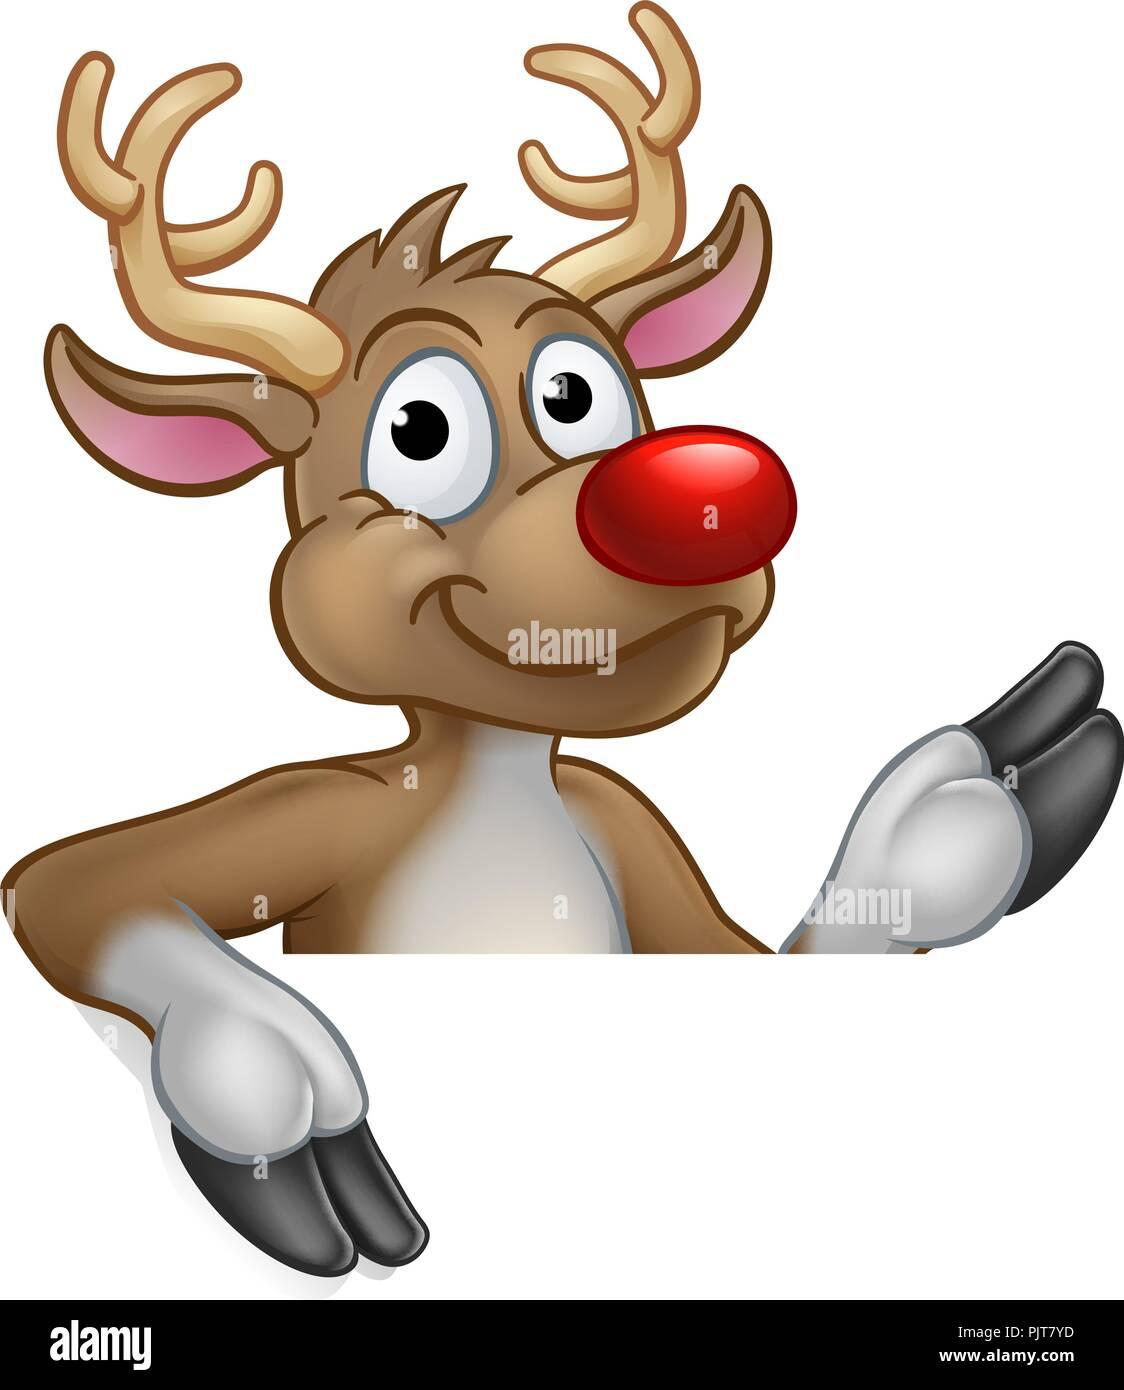 Reindeer Christmas Cartoon Character - Stock Image